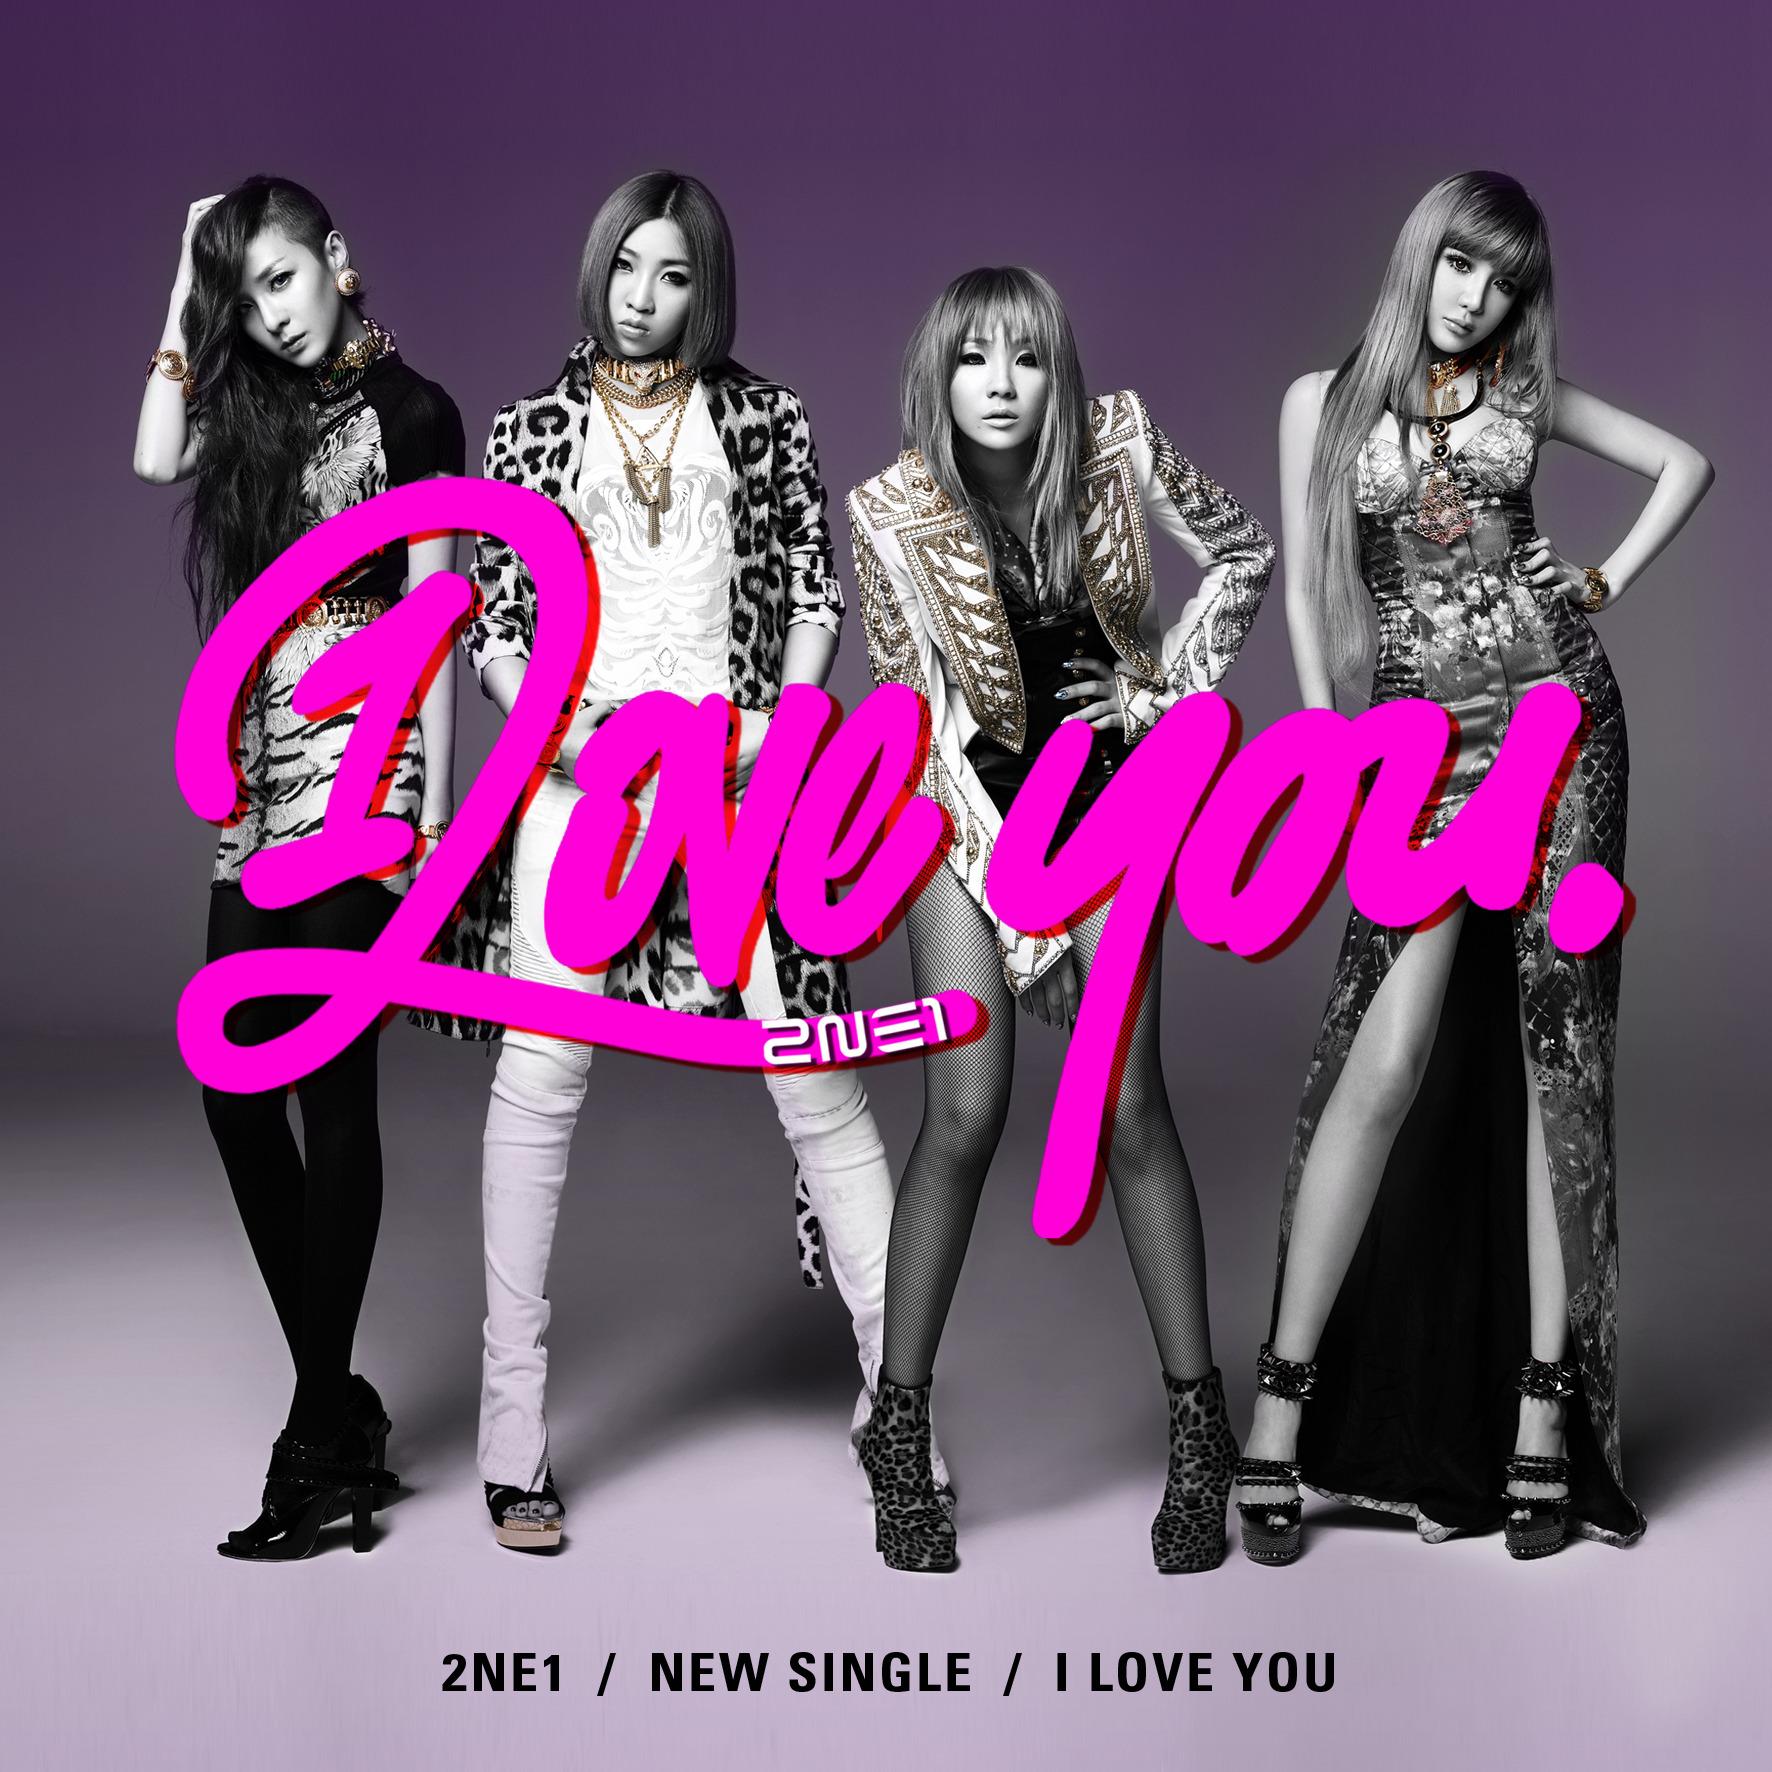 2NE1_New_Single_I love you